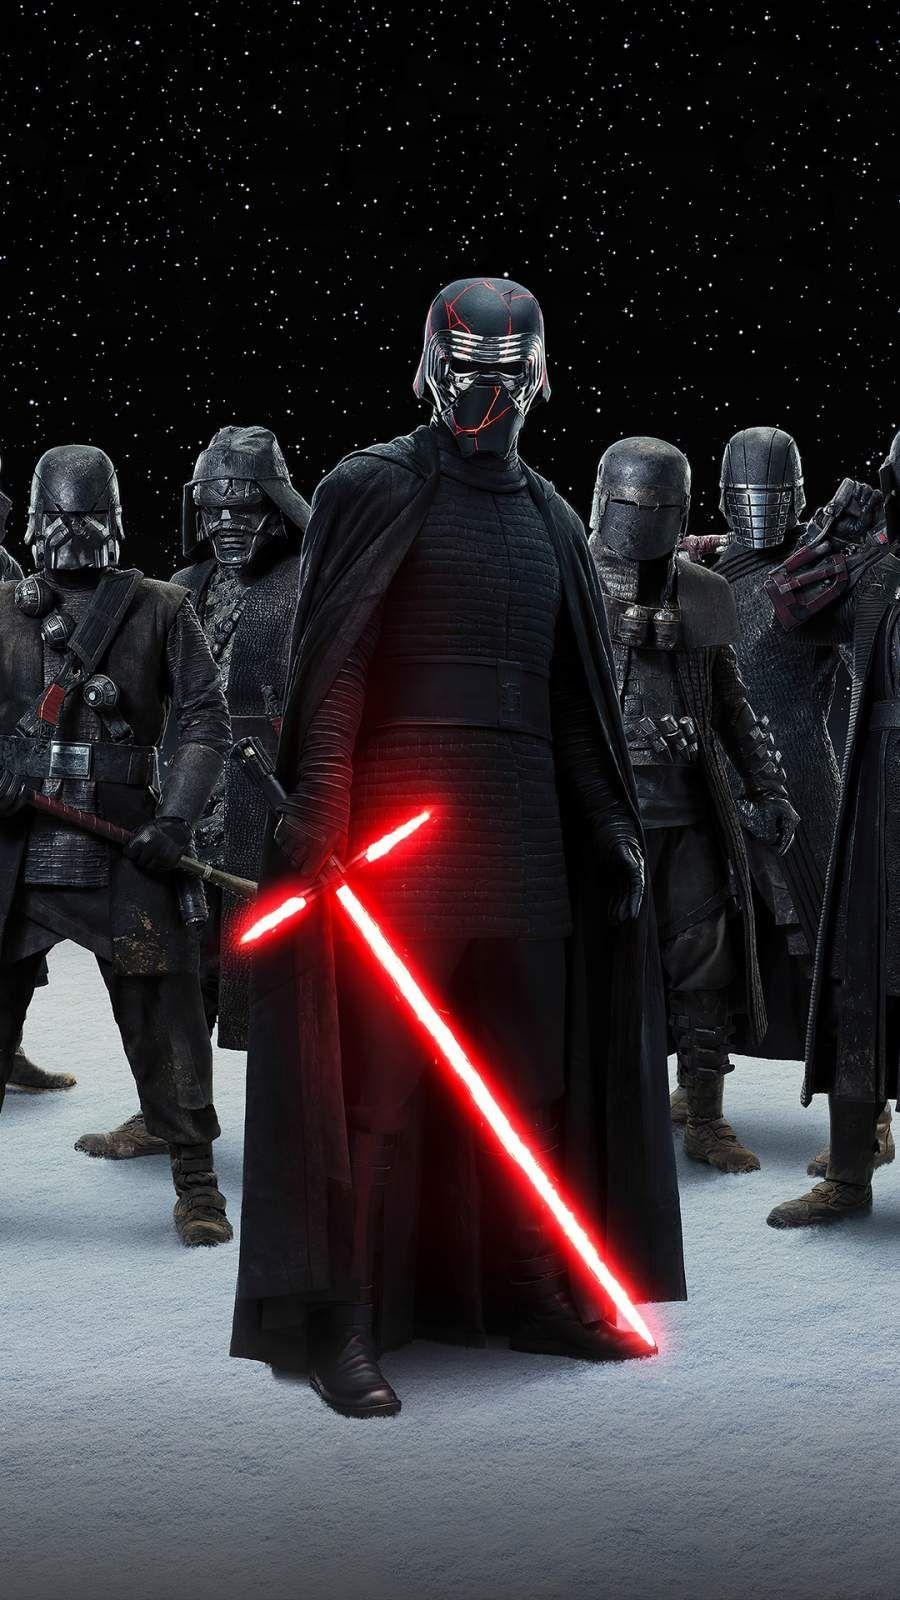 Star Wars Kylo Ren Army Iphone Wallpaper Star Wars Drawings Star Wars Pictures Star Wars Poster